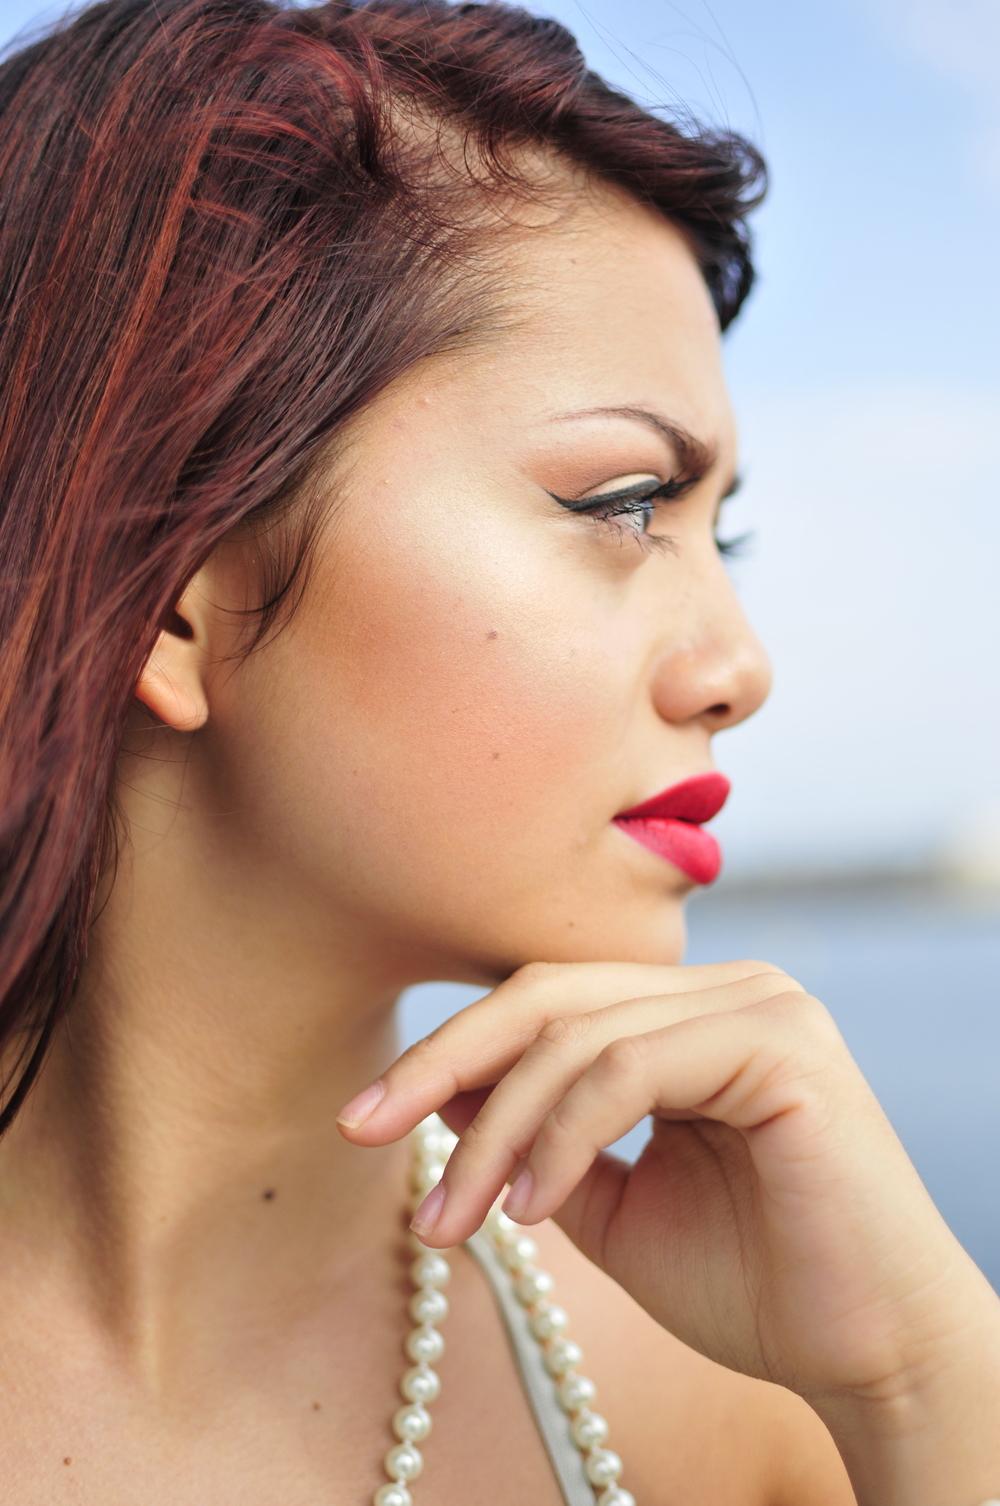 Sharon, Model